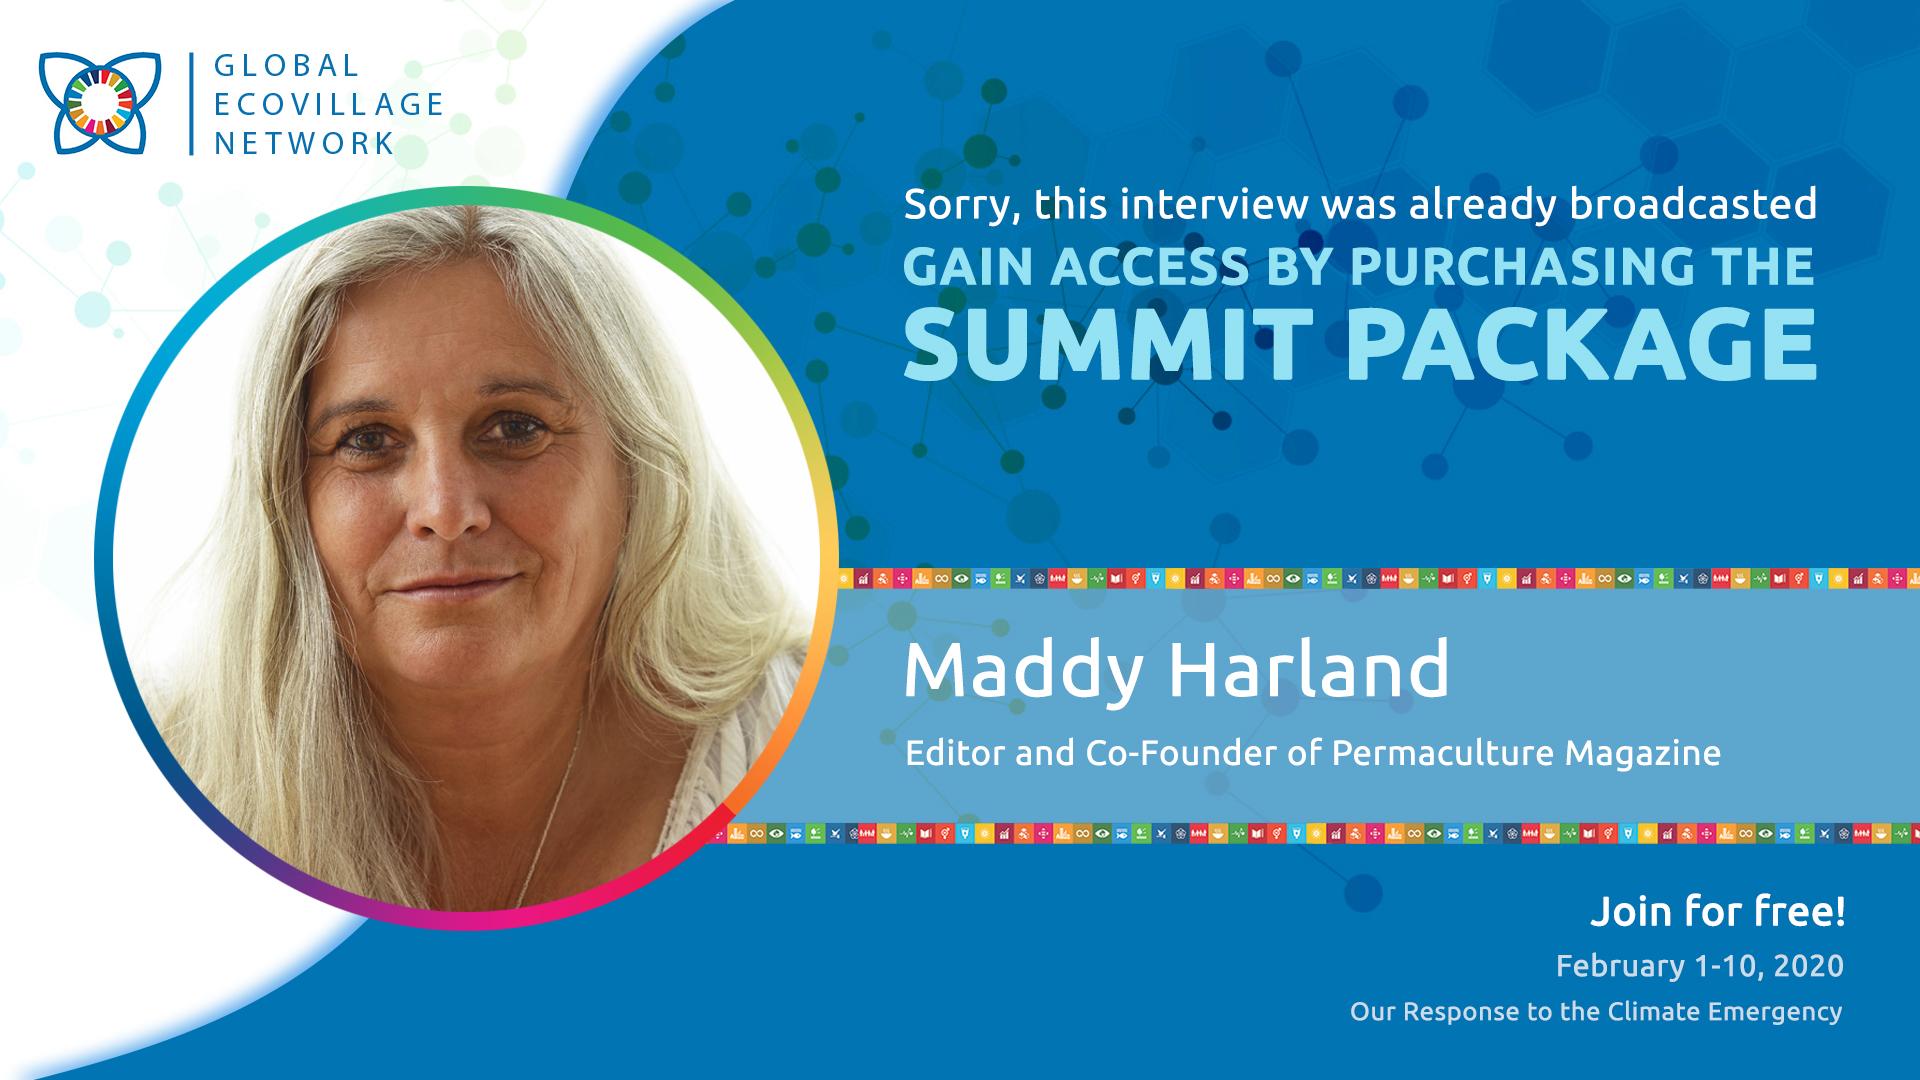 Maddy Harland